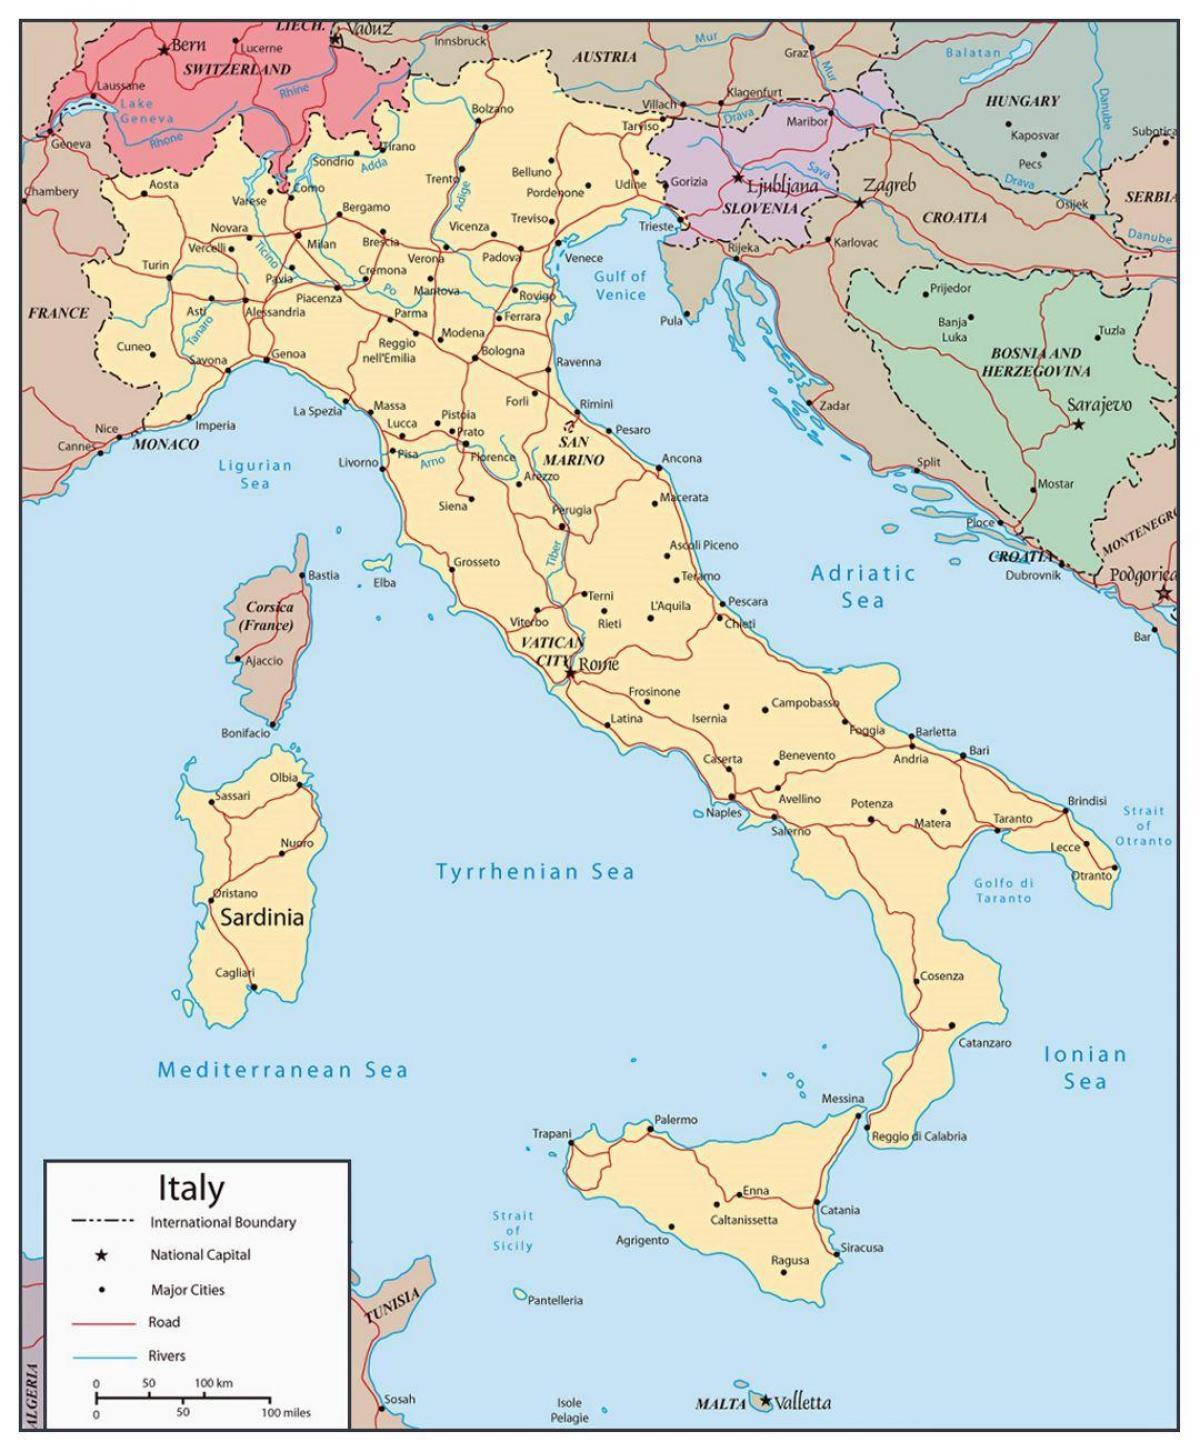 Karta Over Italien Med Stader Karta Over Italien Visar Storre